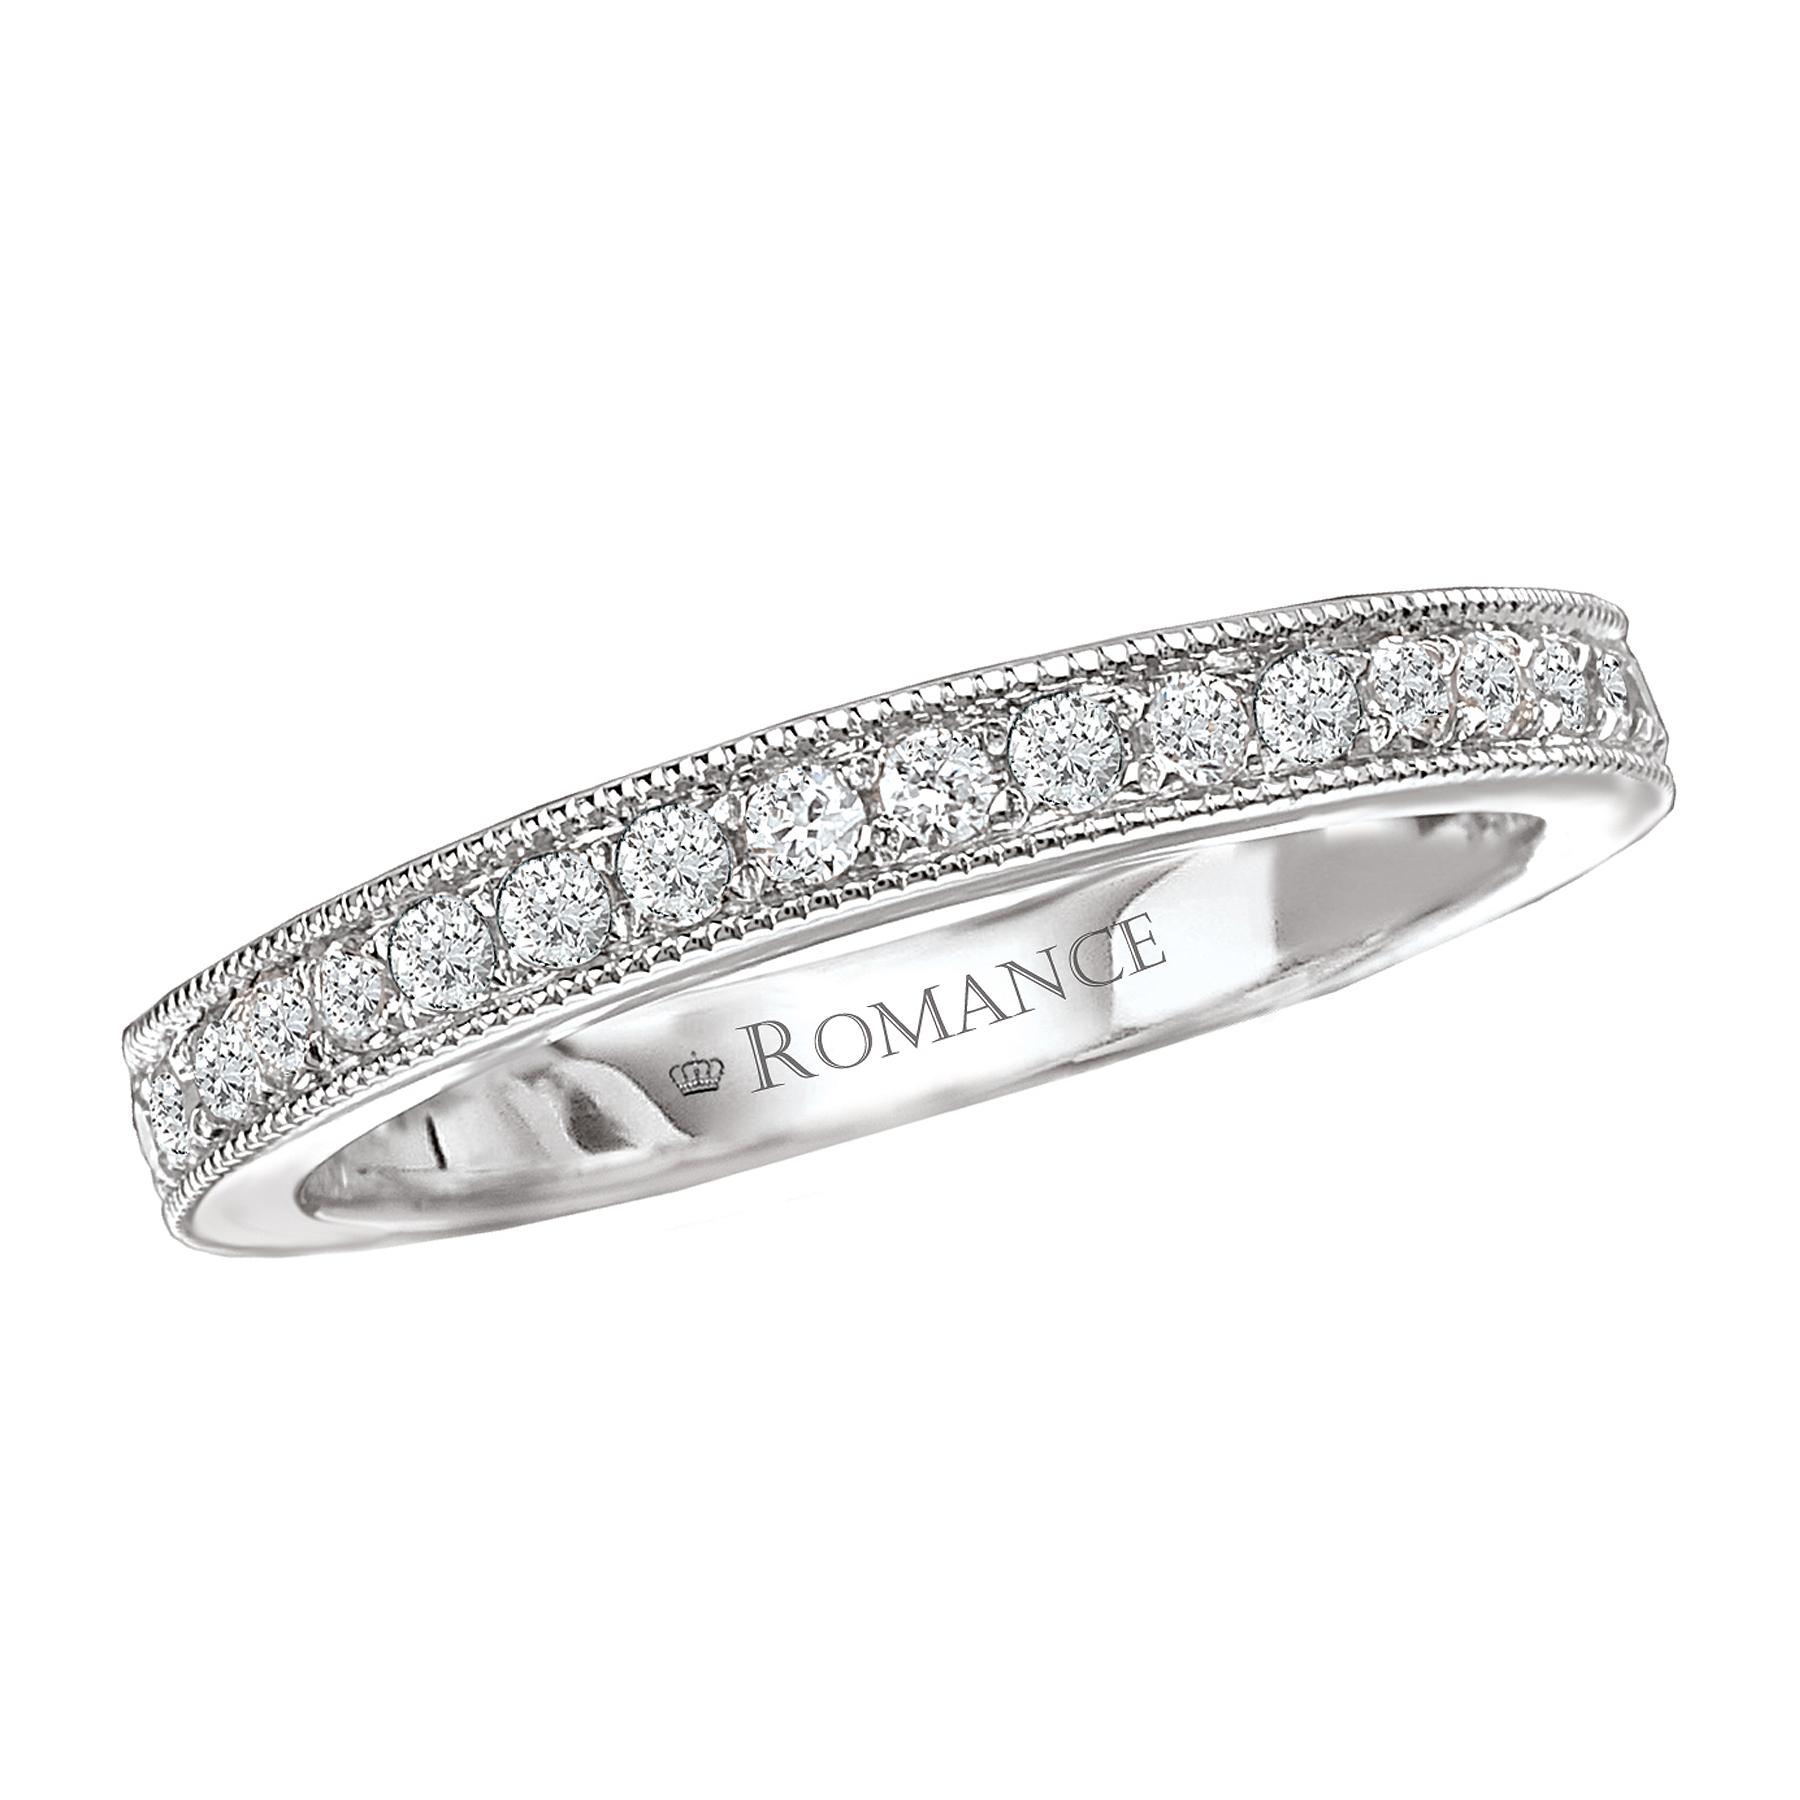 Romance Wedding Bands 117336-W product image